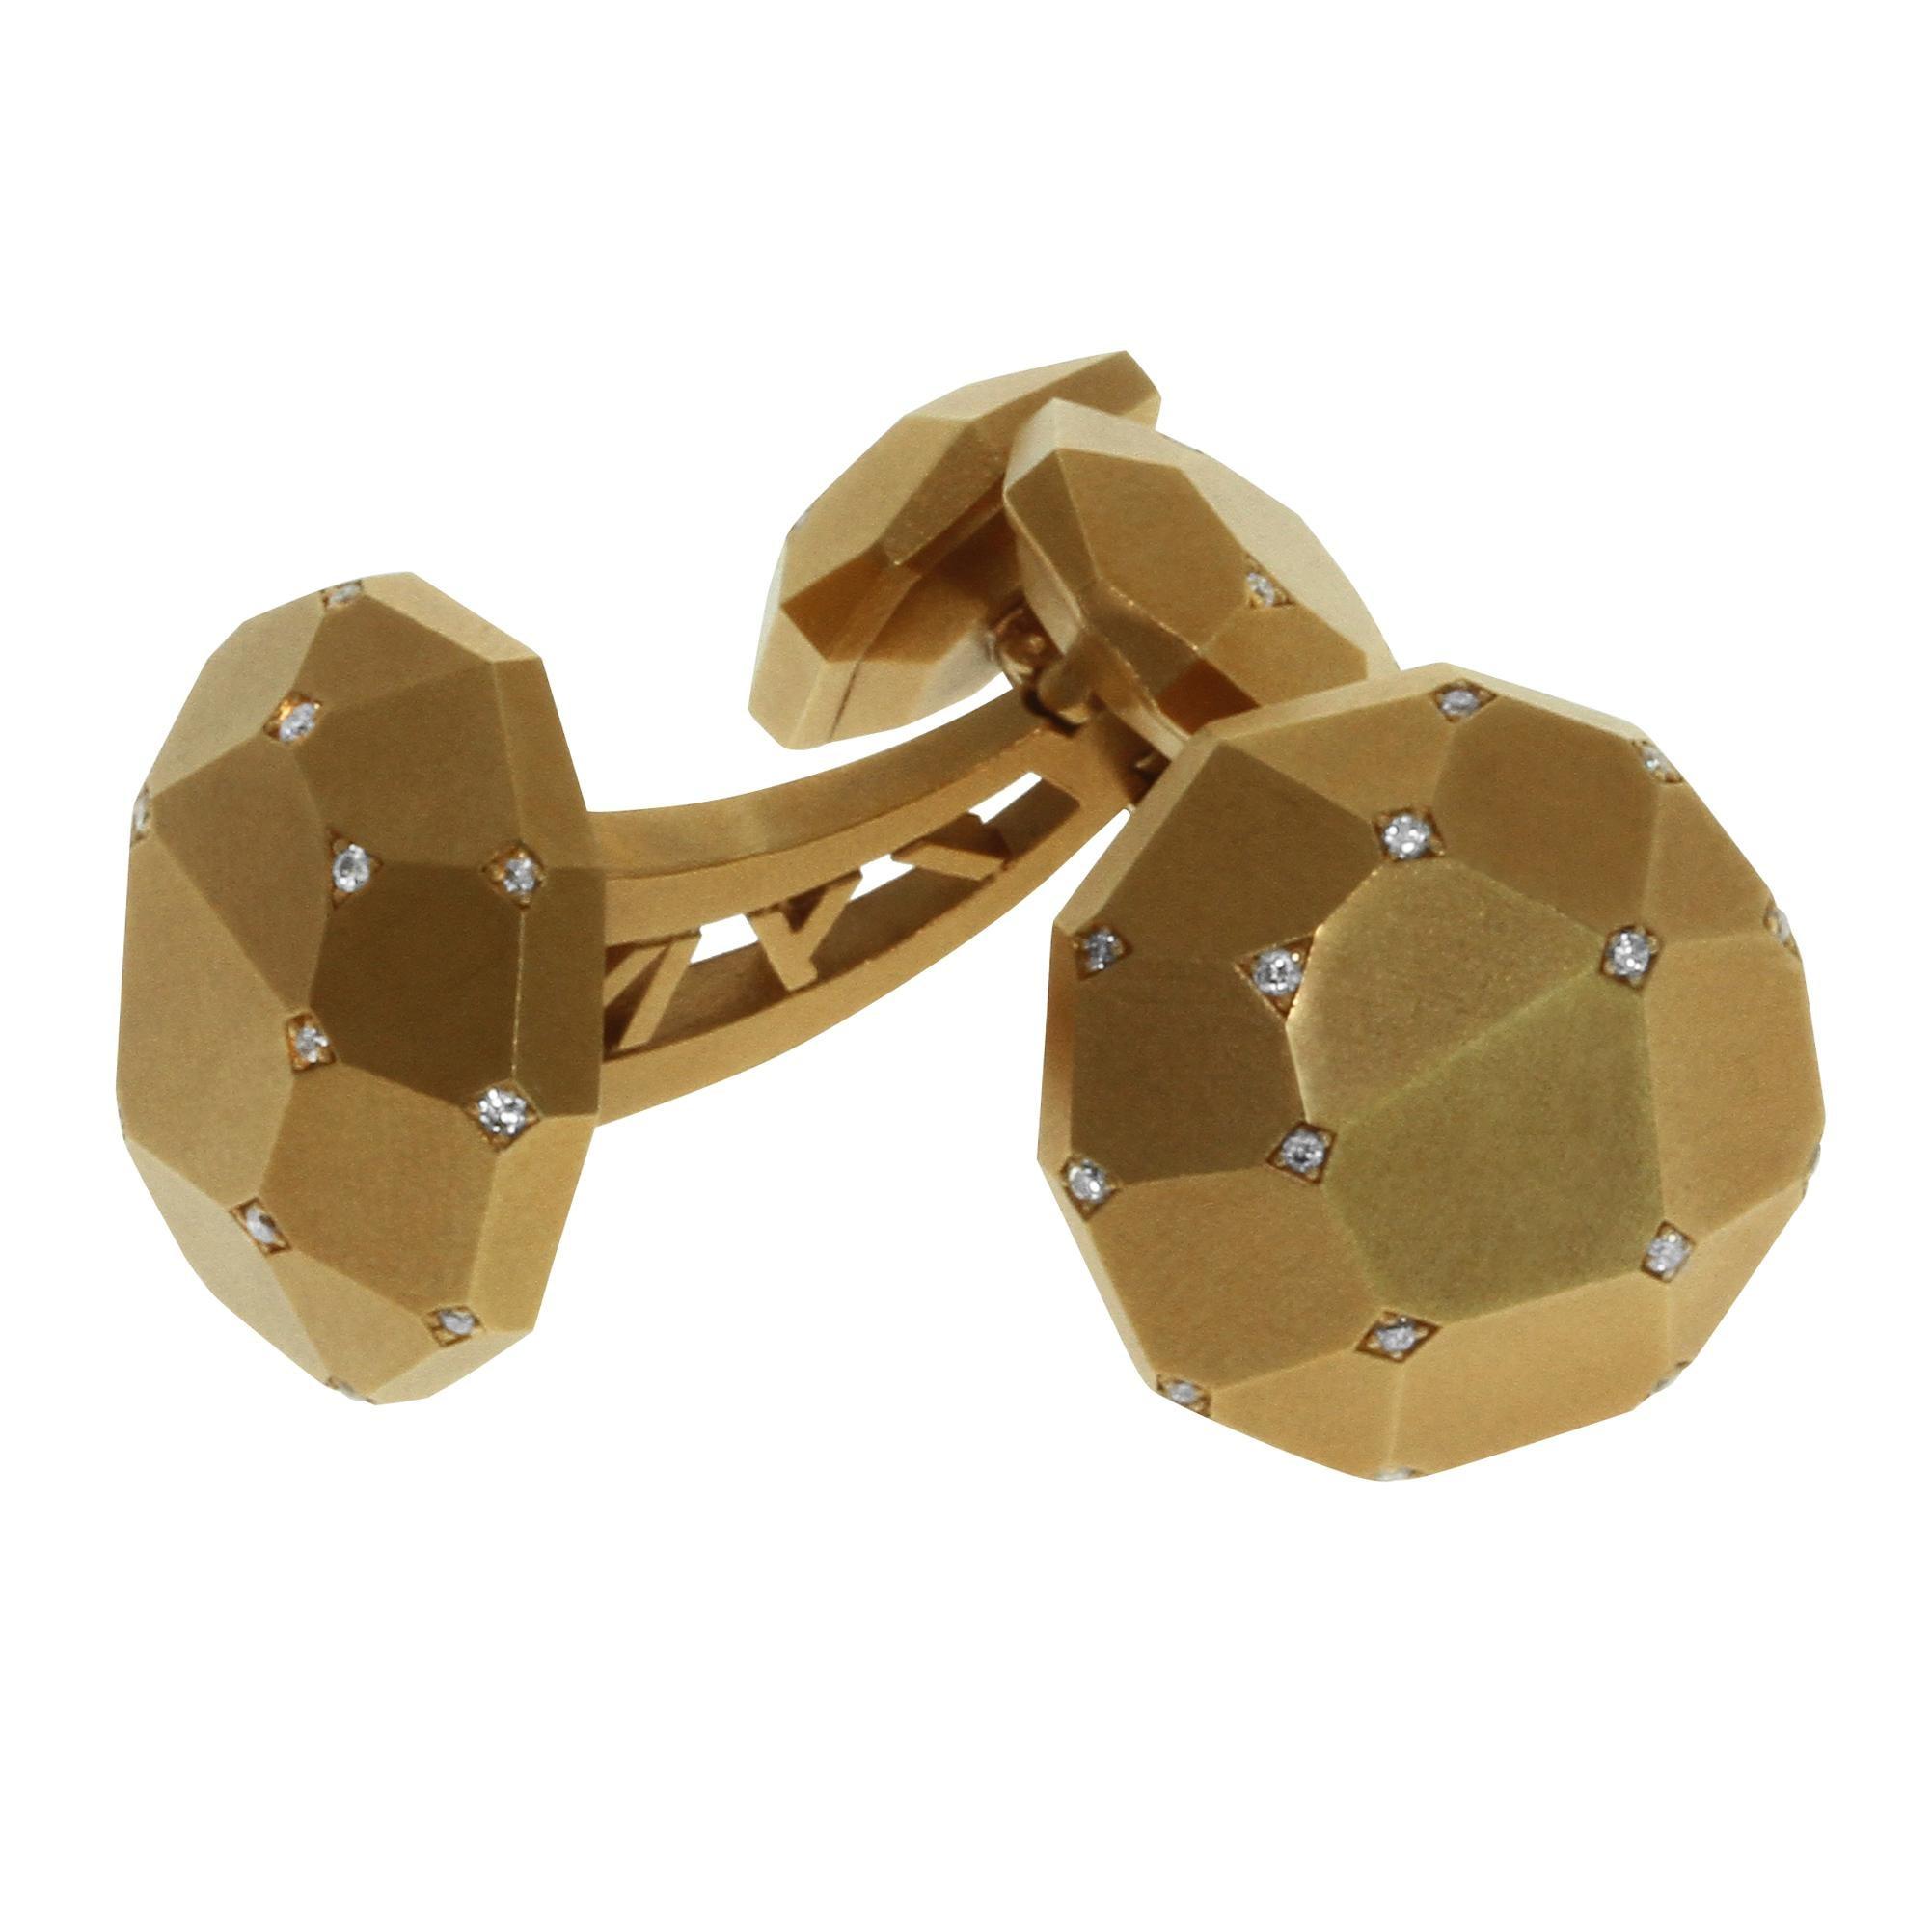 Diamond 18 Karat Yellow Gold Geometry Cufflinks